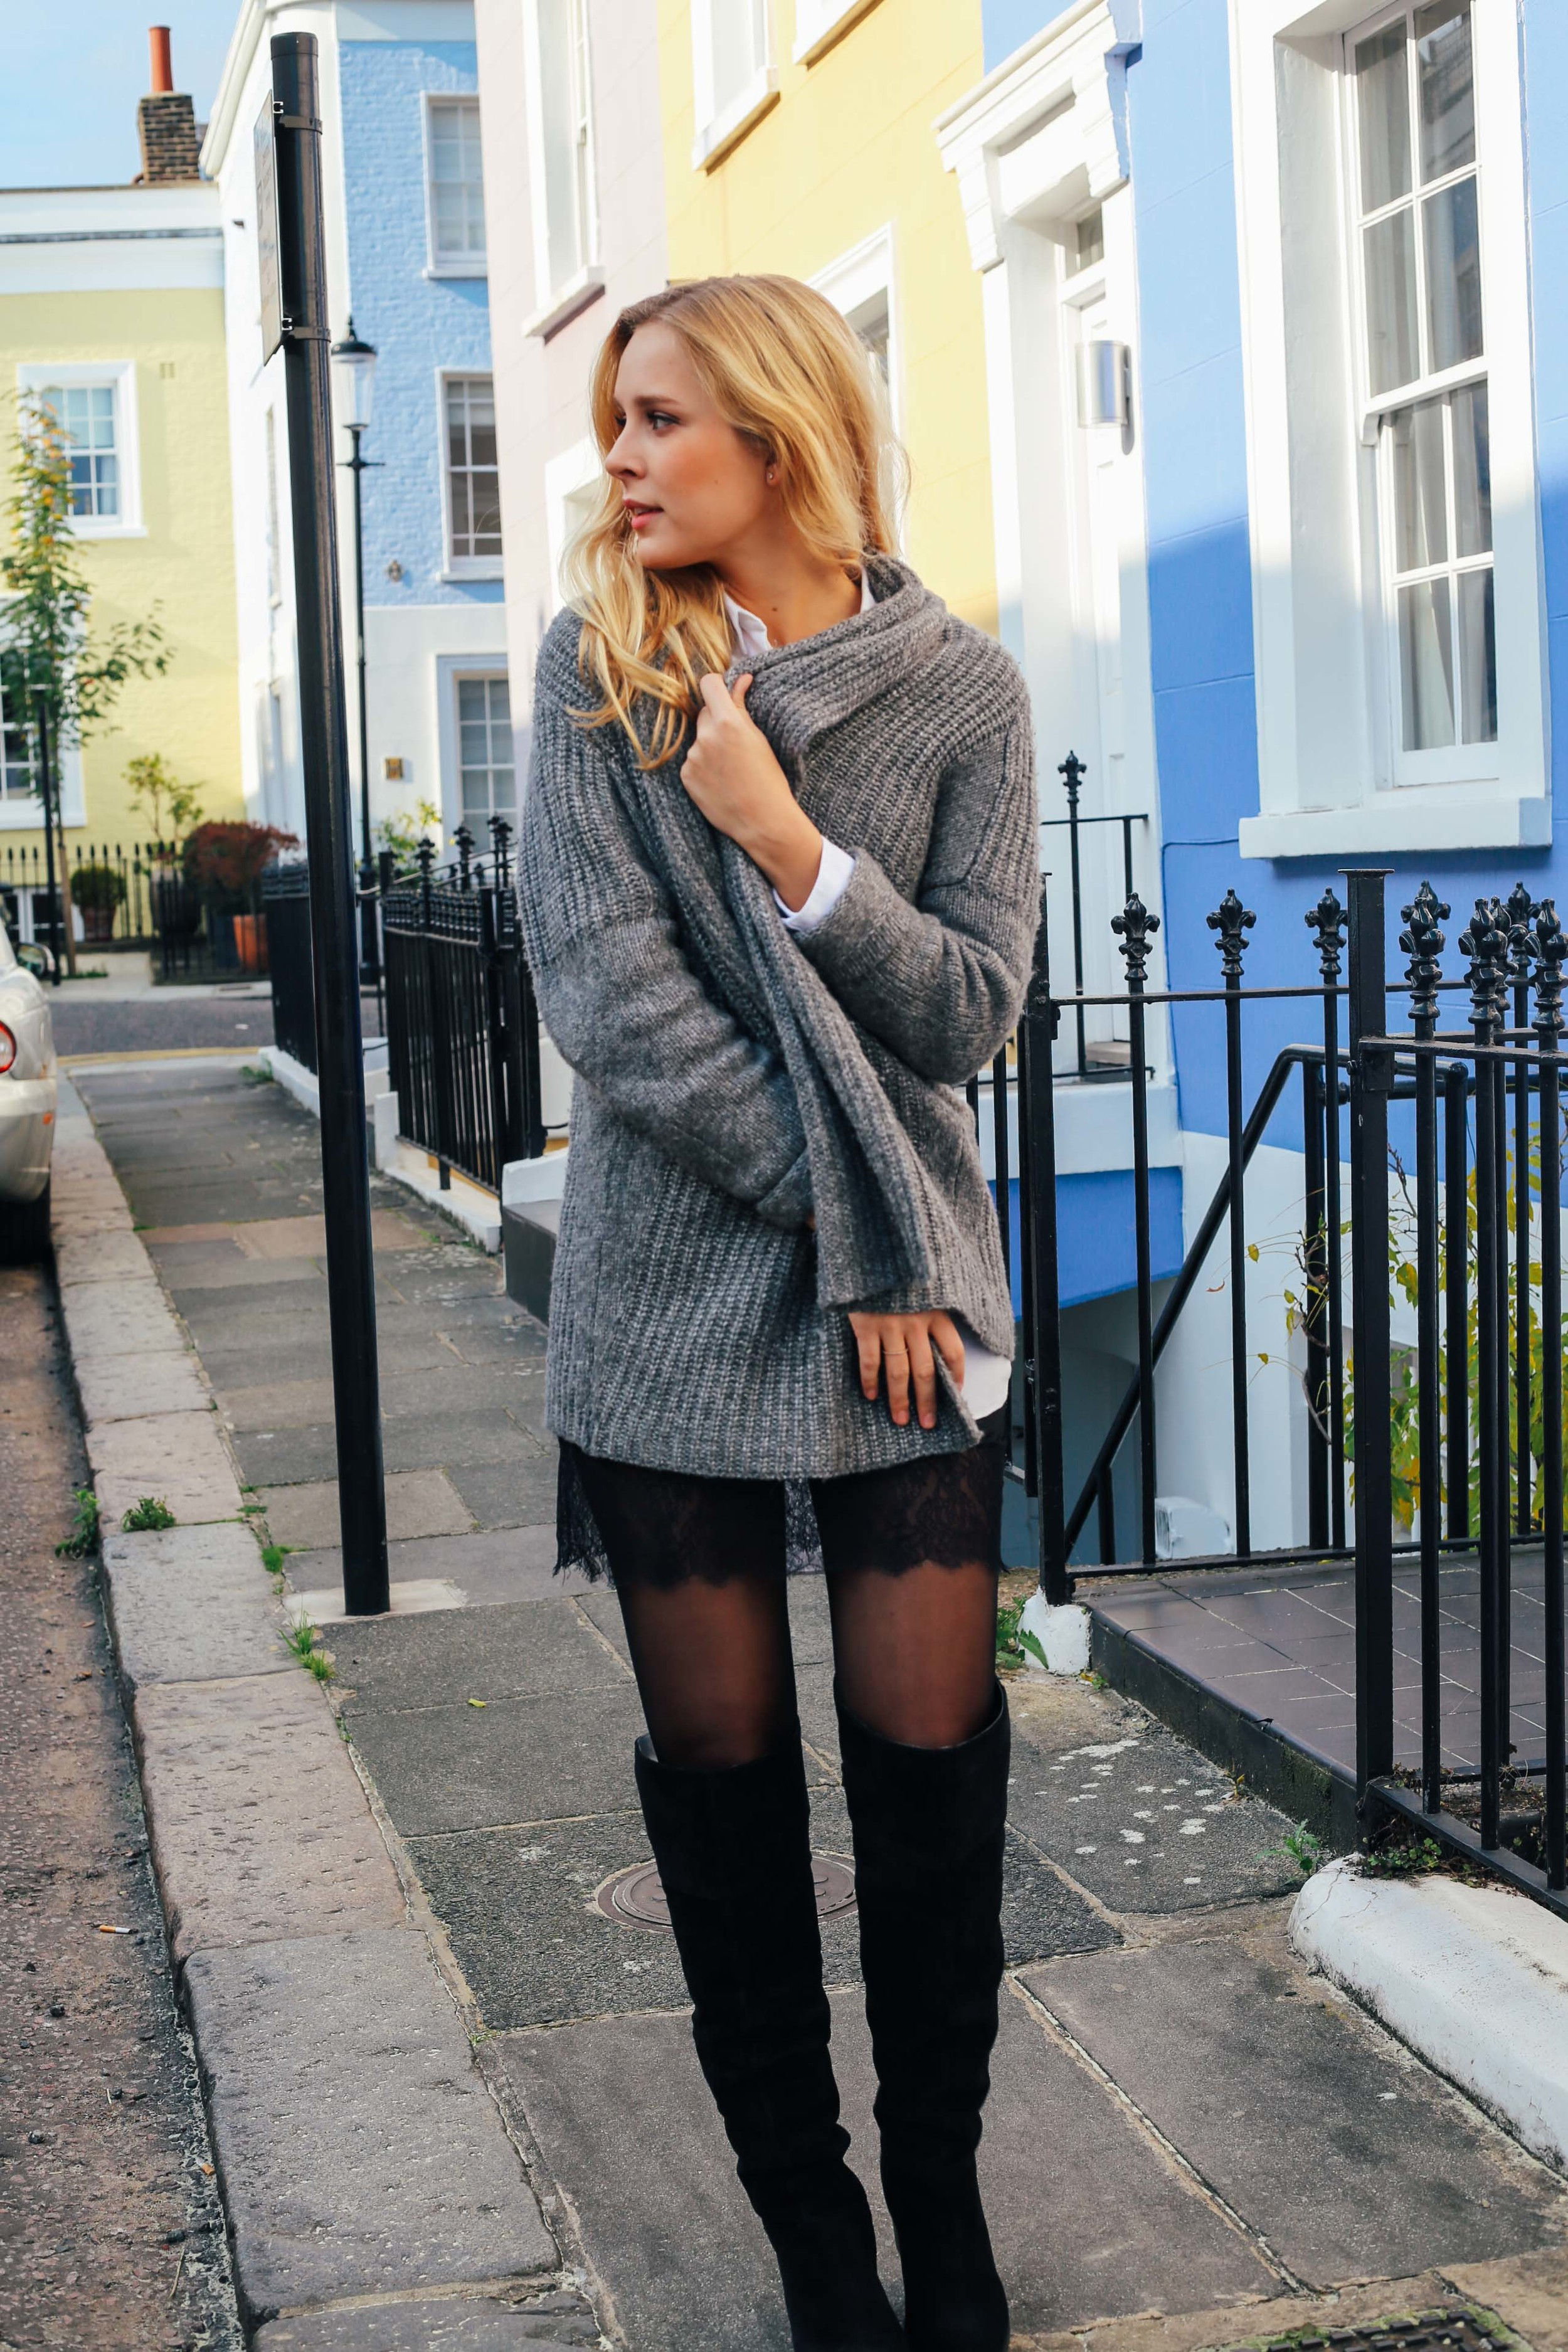 Autumn walks in Notting Hill